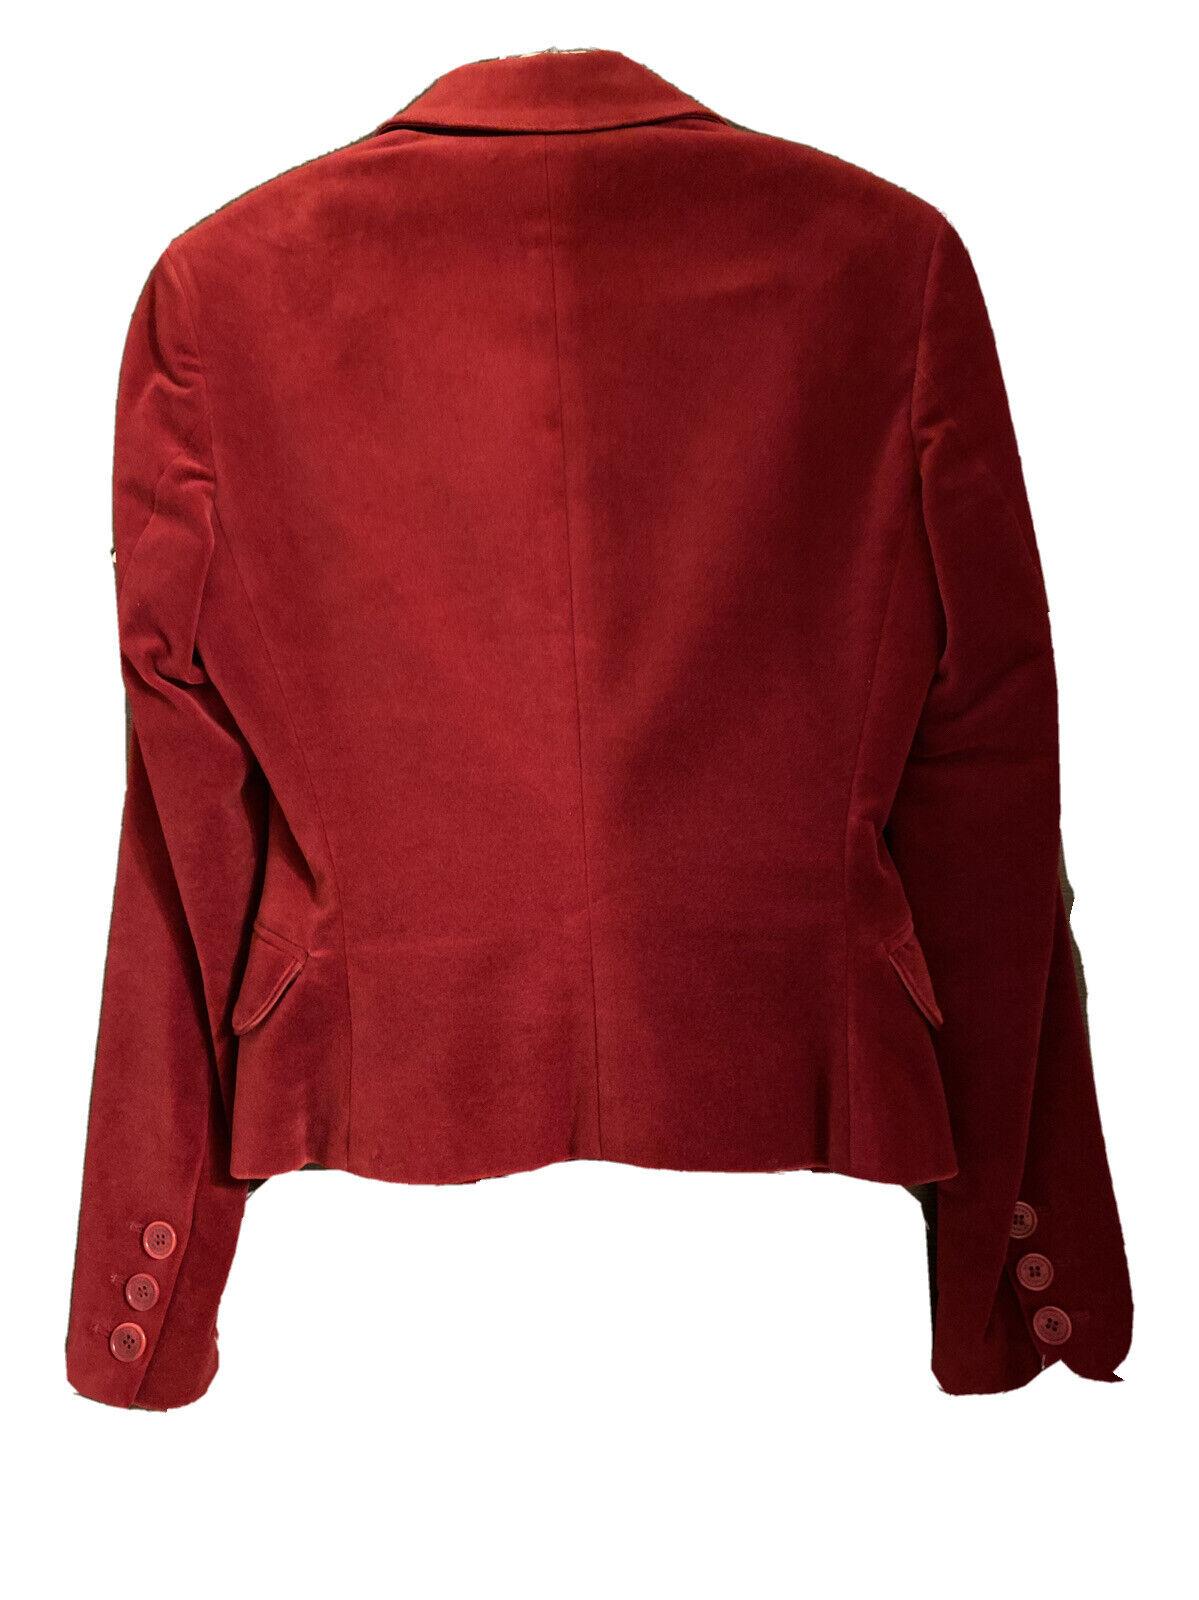 GF FERRE Vintage Red Velvet Velour Jacket Blazer … - image 4